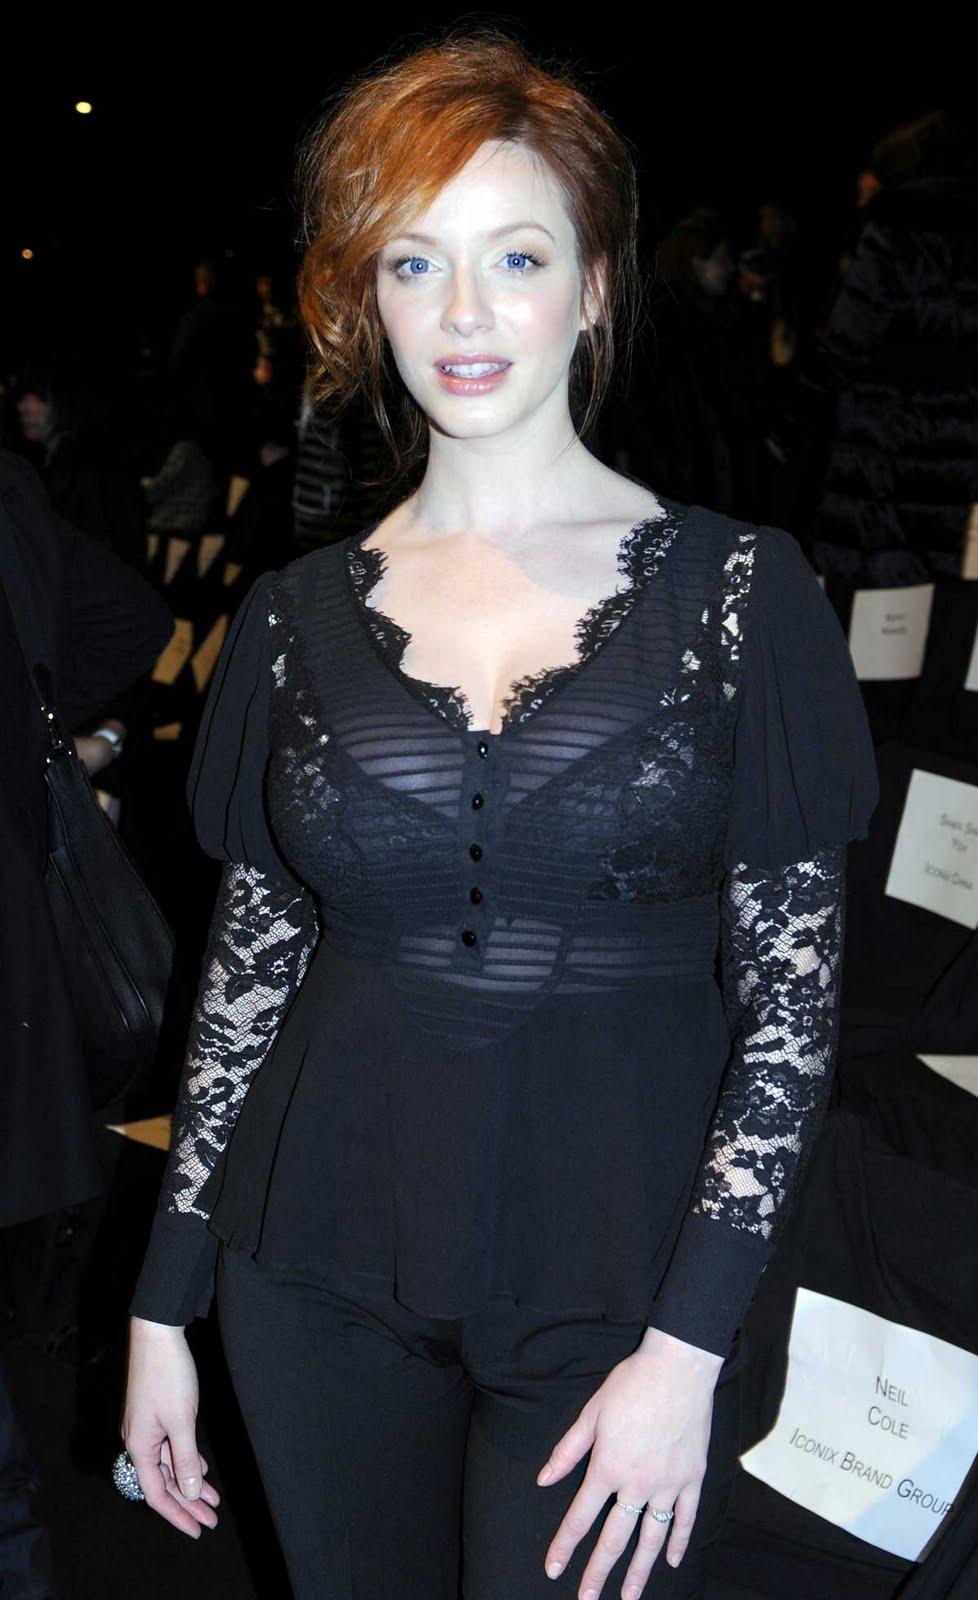 2010 redhead actress SIMPLY FUCKING